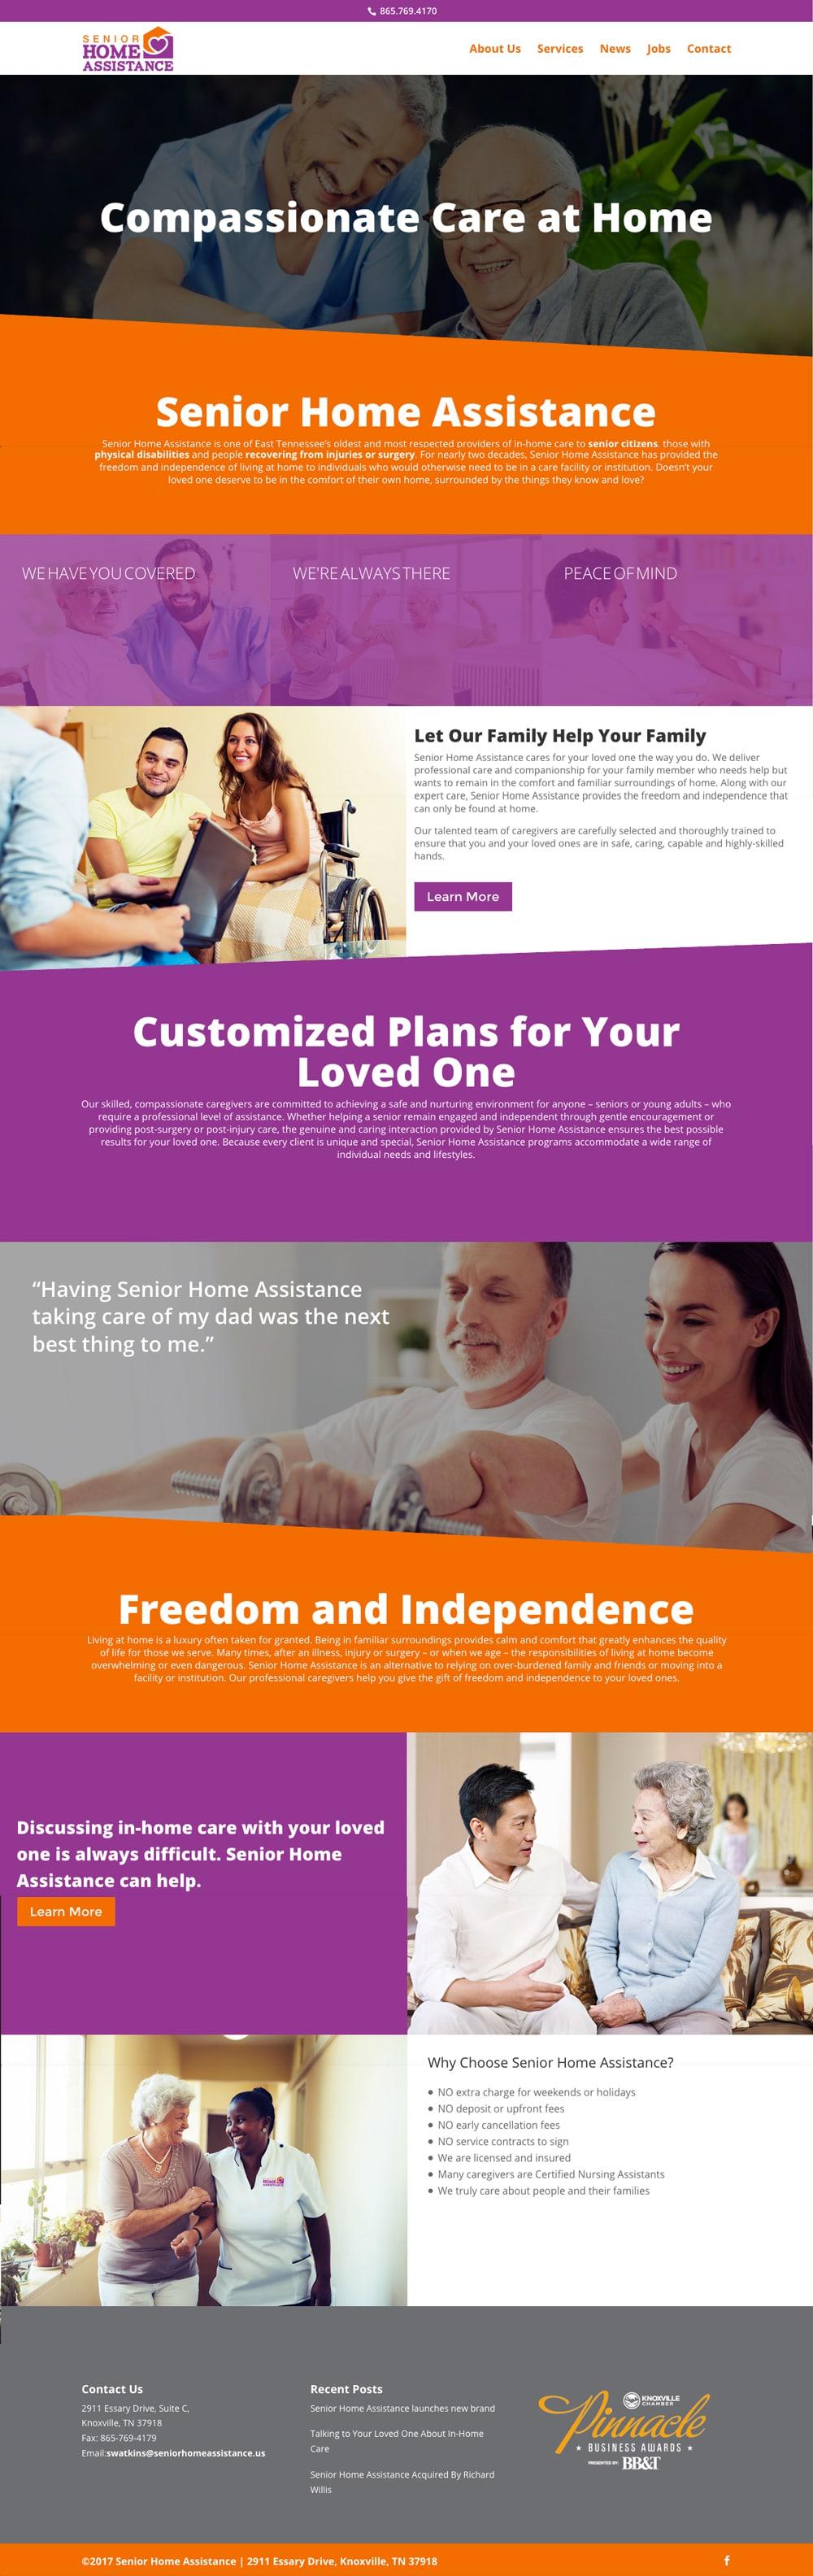 senior-home-assistance